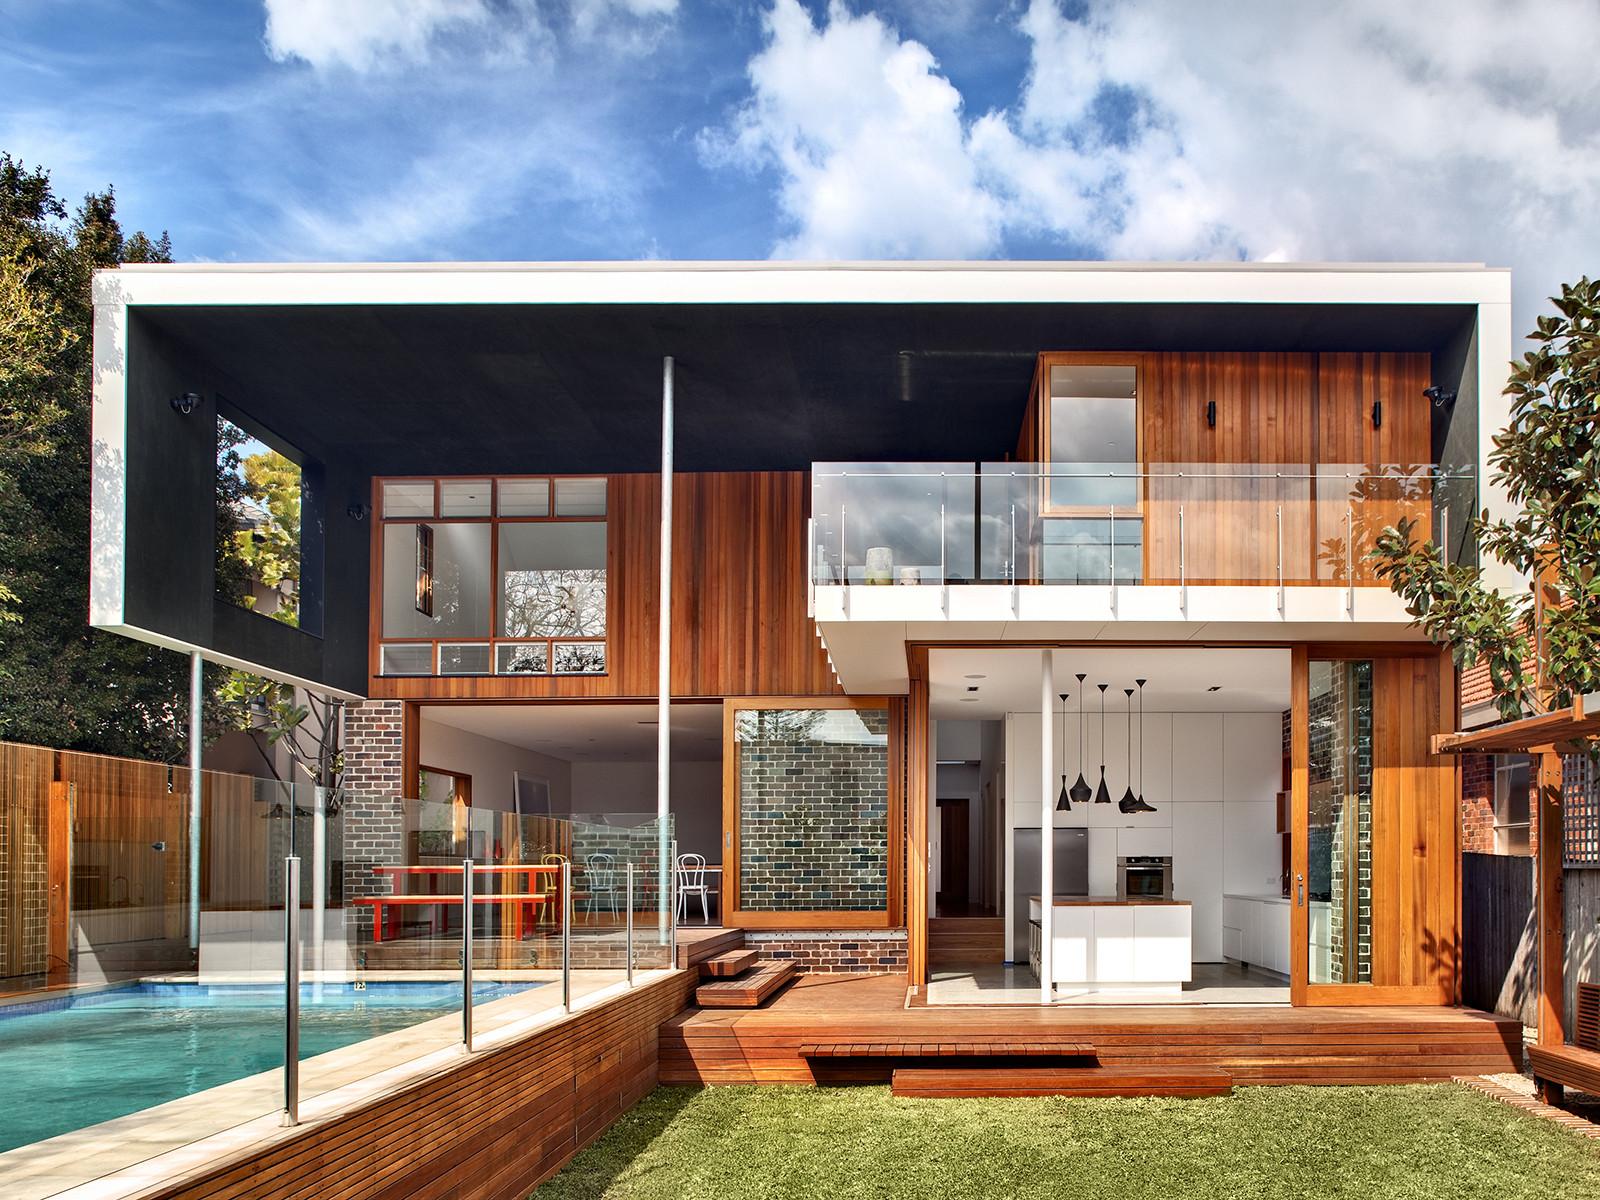 FRANKENGRAY HOUSE